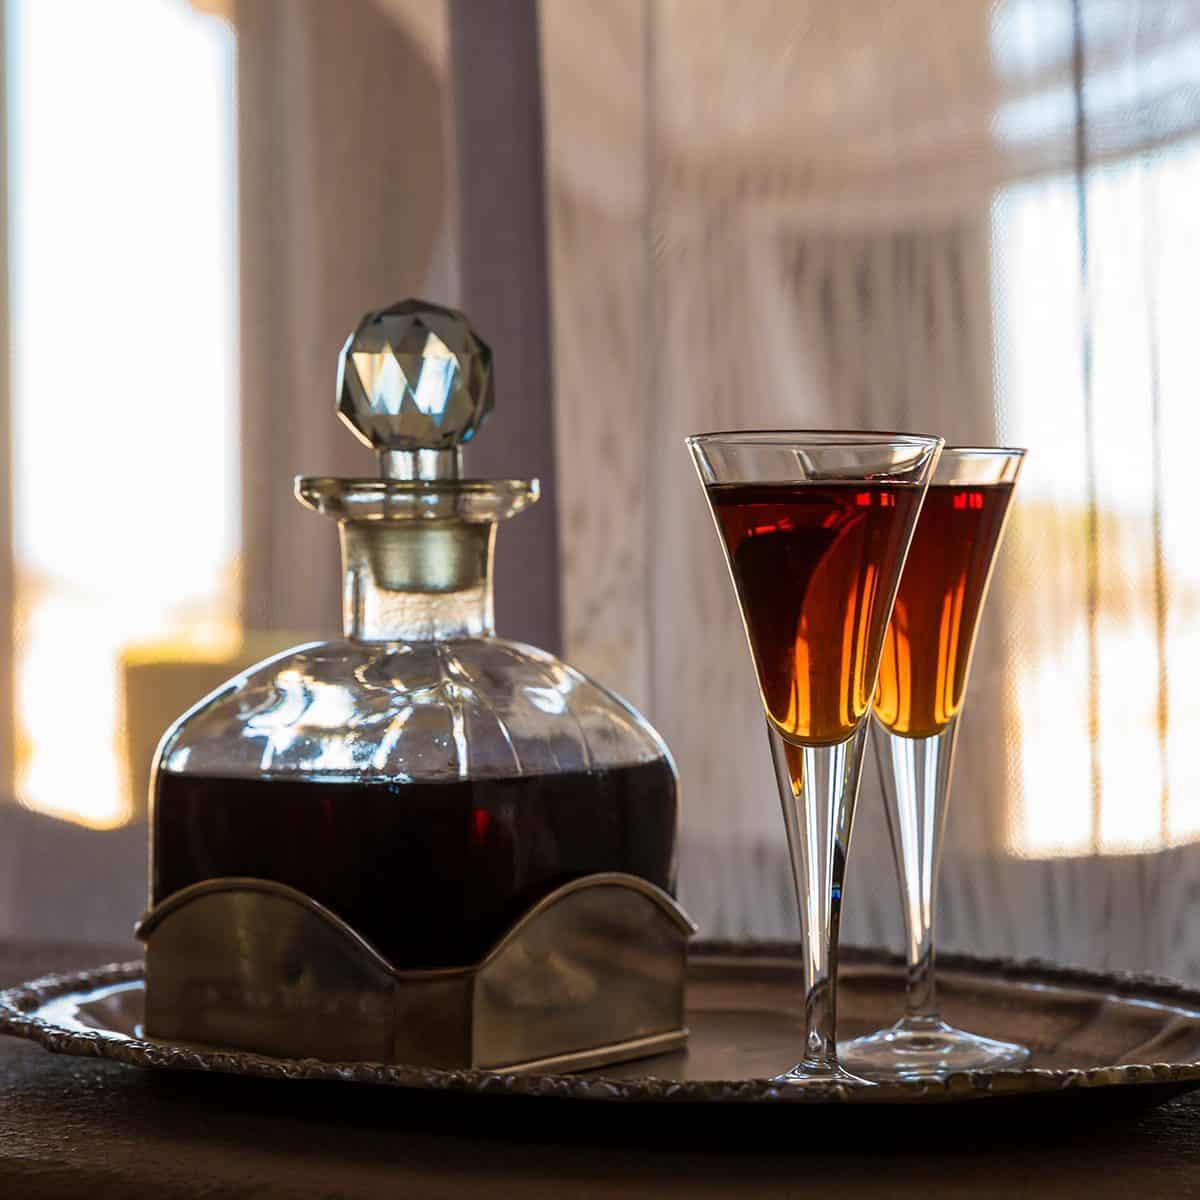 TWO GLASSES AN A CARAFE FILLED WITH RED SHERRY IN A ROOM SHUTTERSTOCK 1196871460 12 BEBIDAS PARA DESPUÉS DE LA CENA QUE DEBES SABER